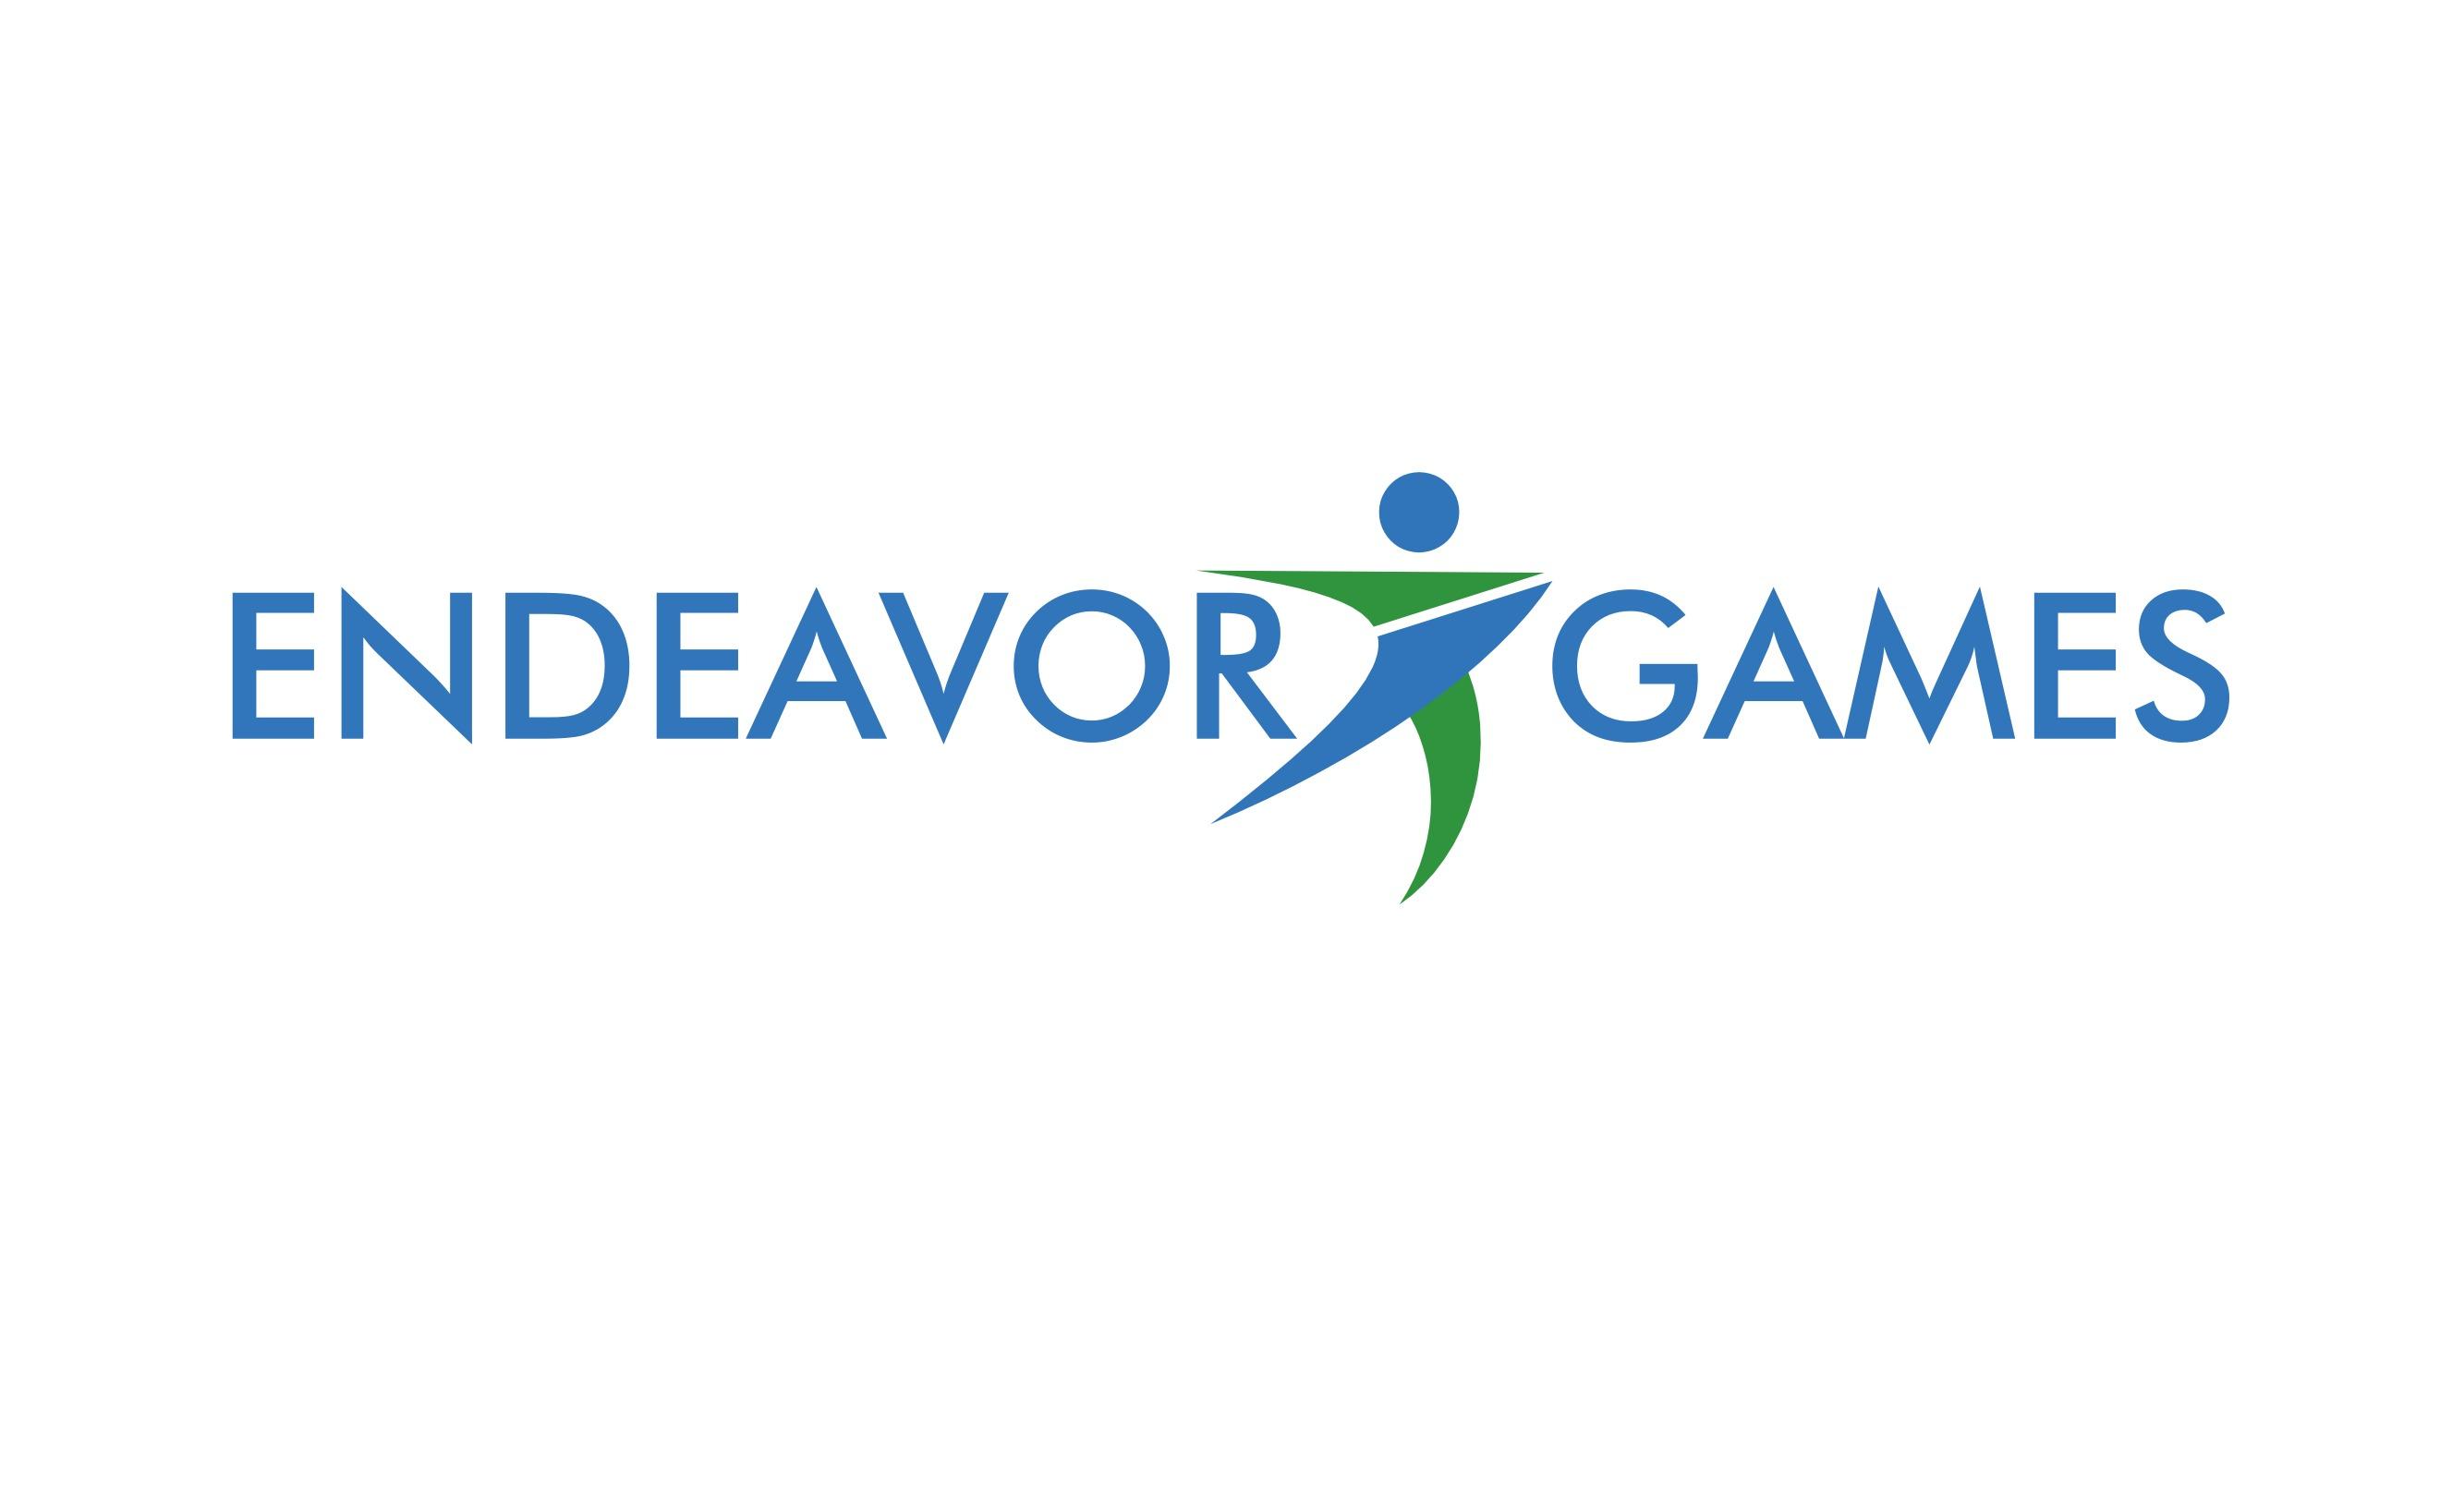 UCO Endeavor Games